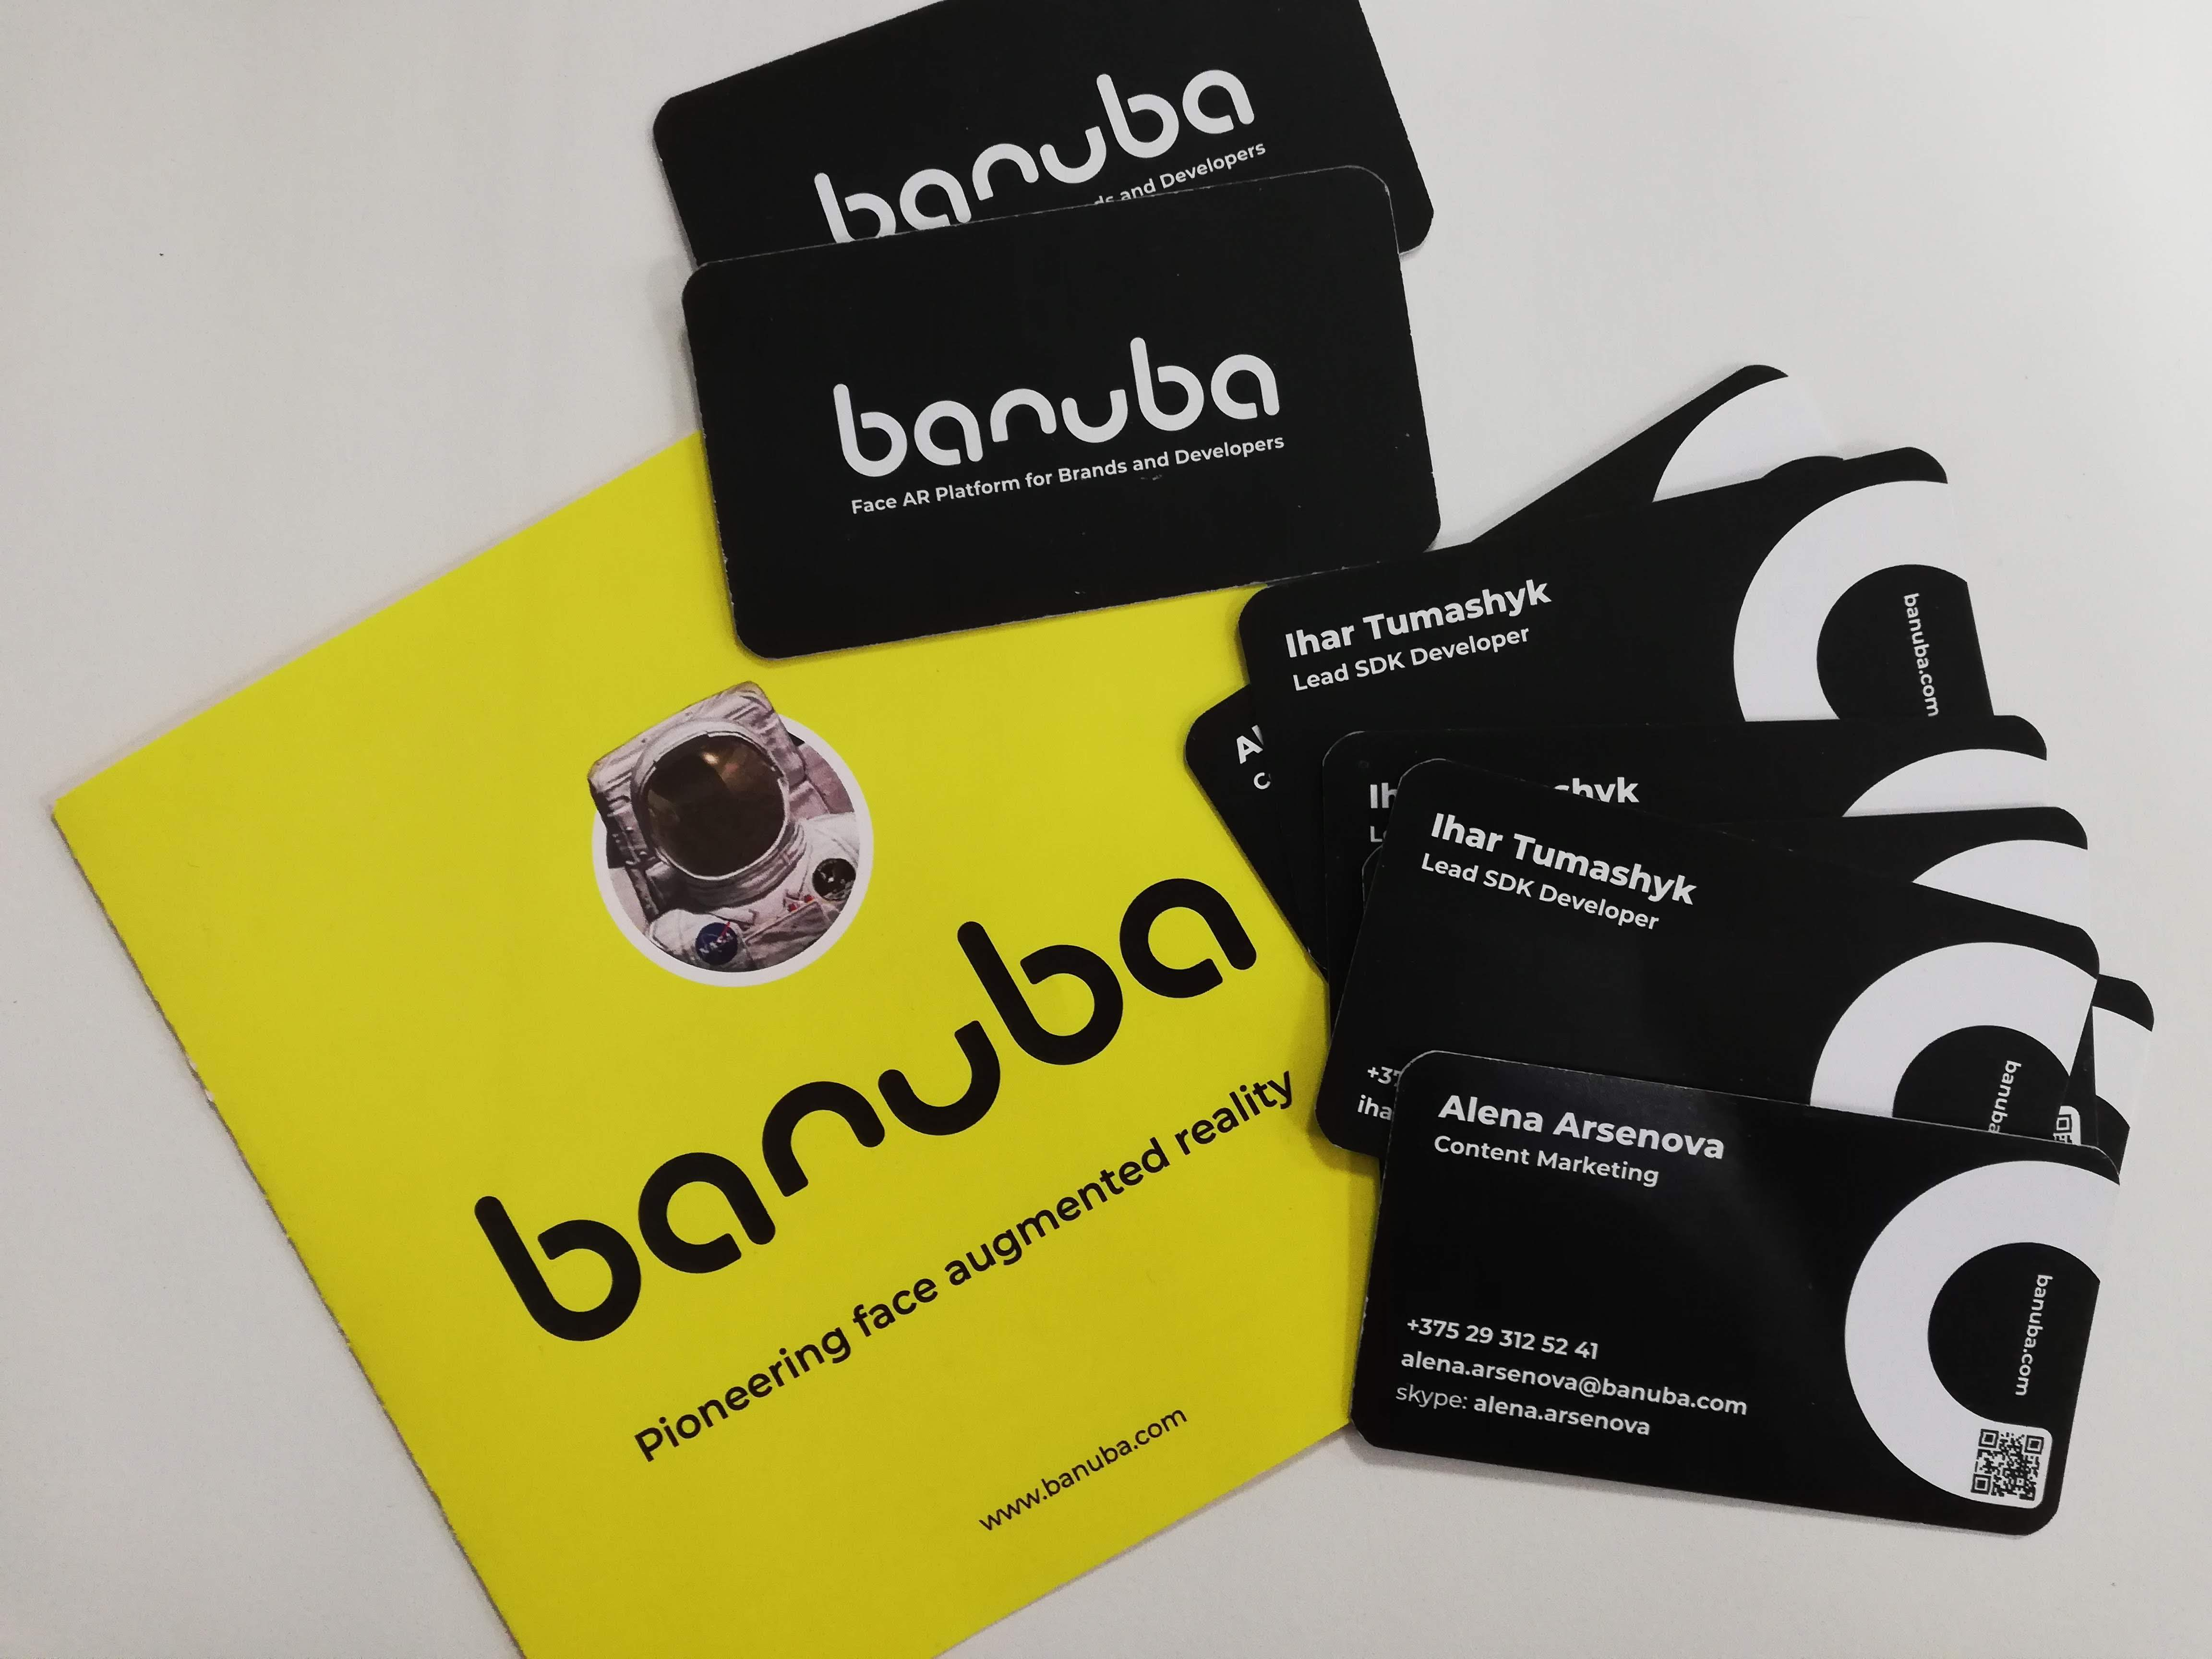 Mobile world congress banuba handouts